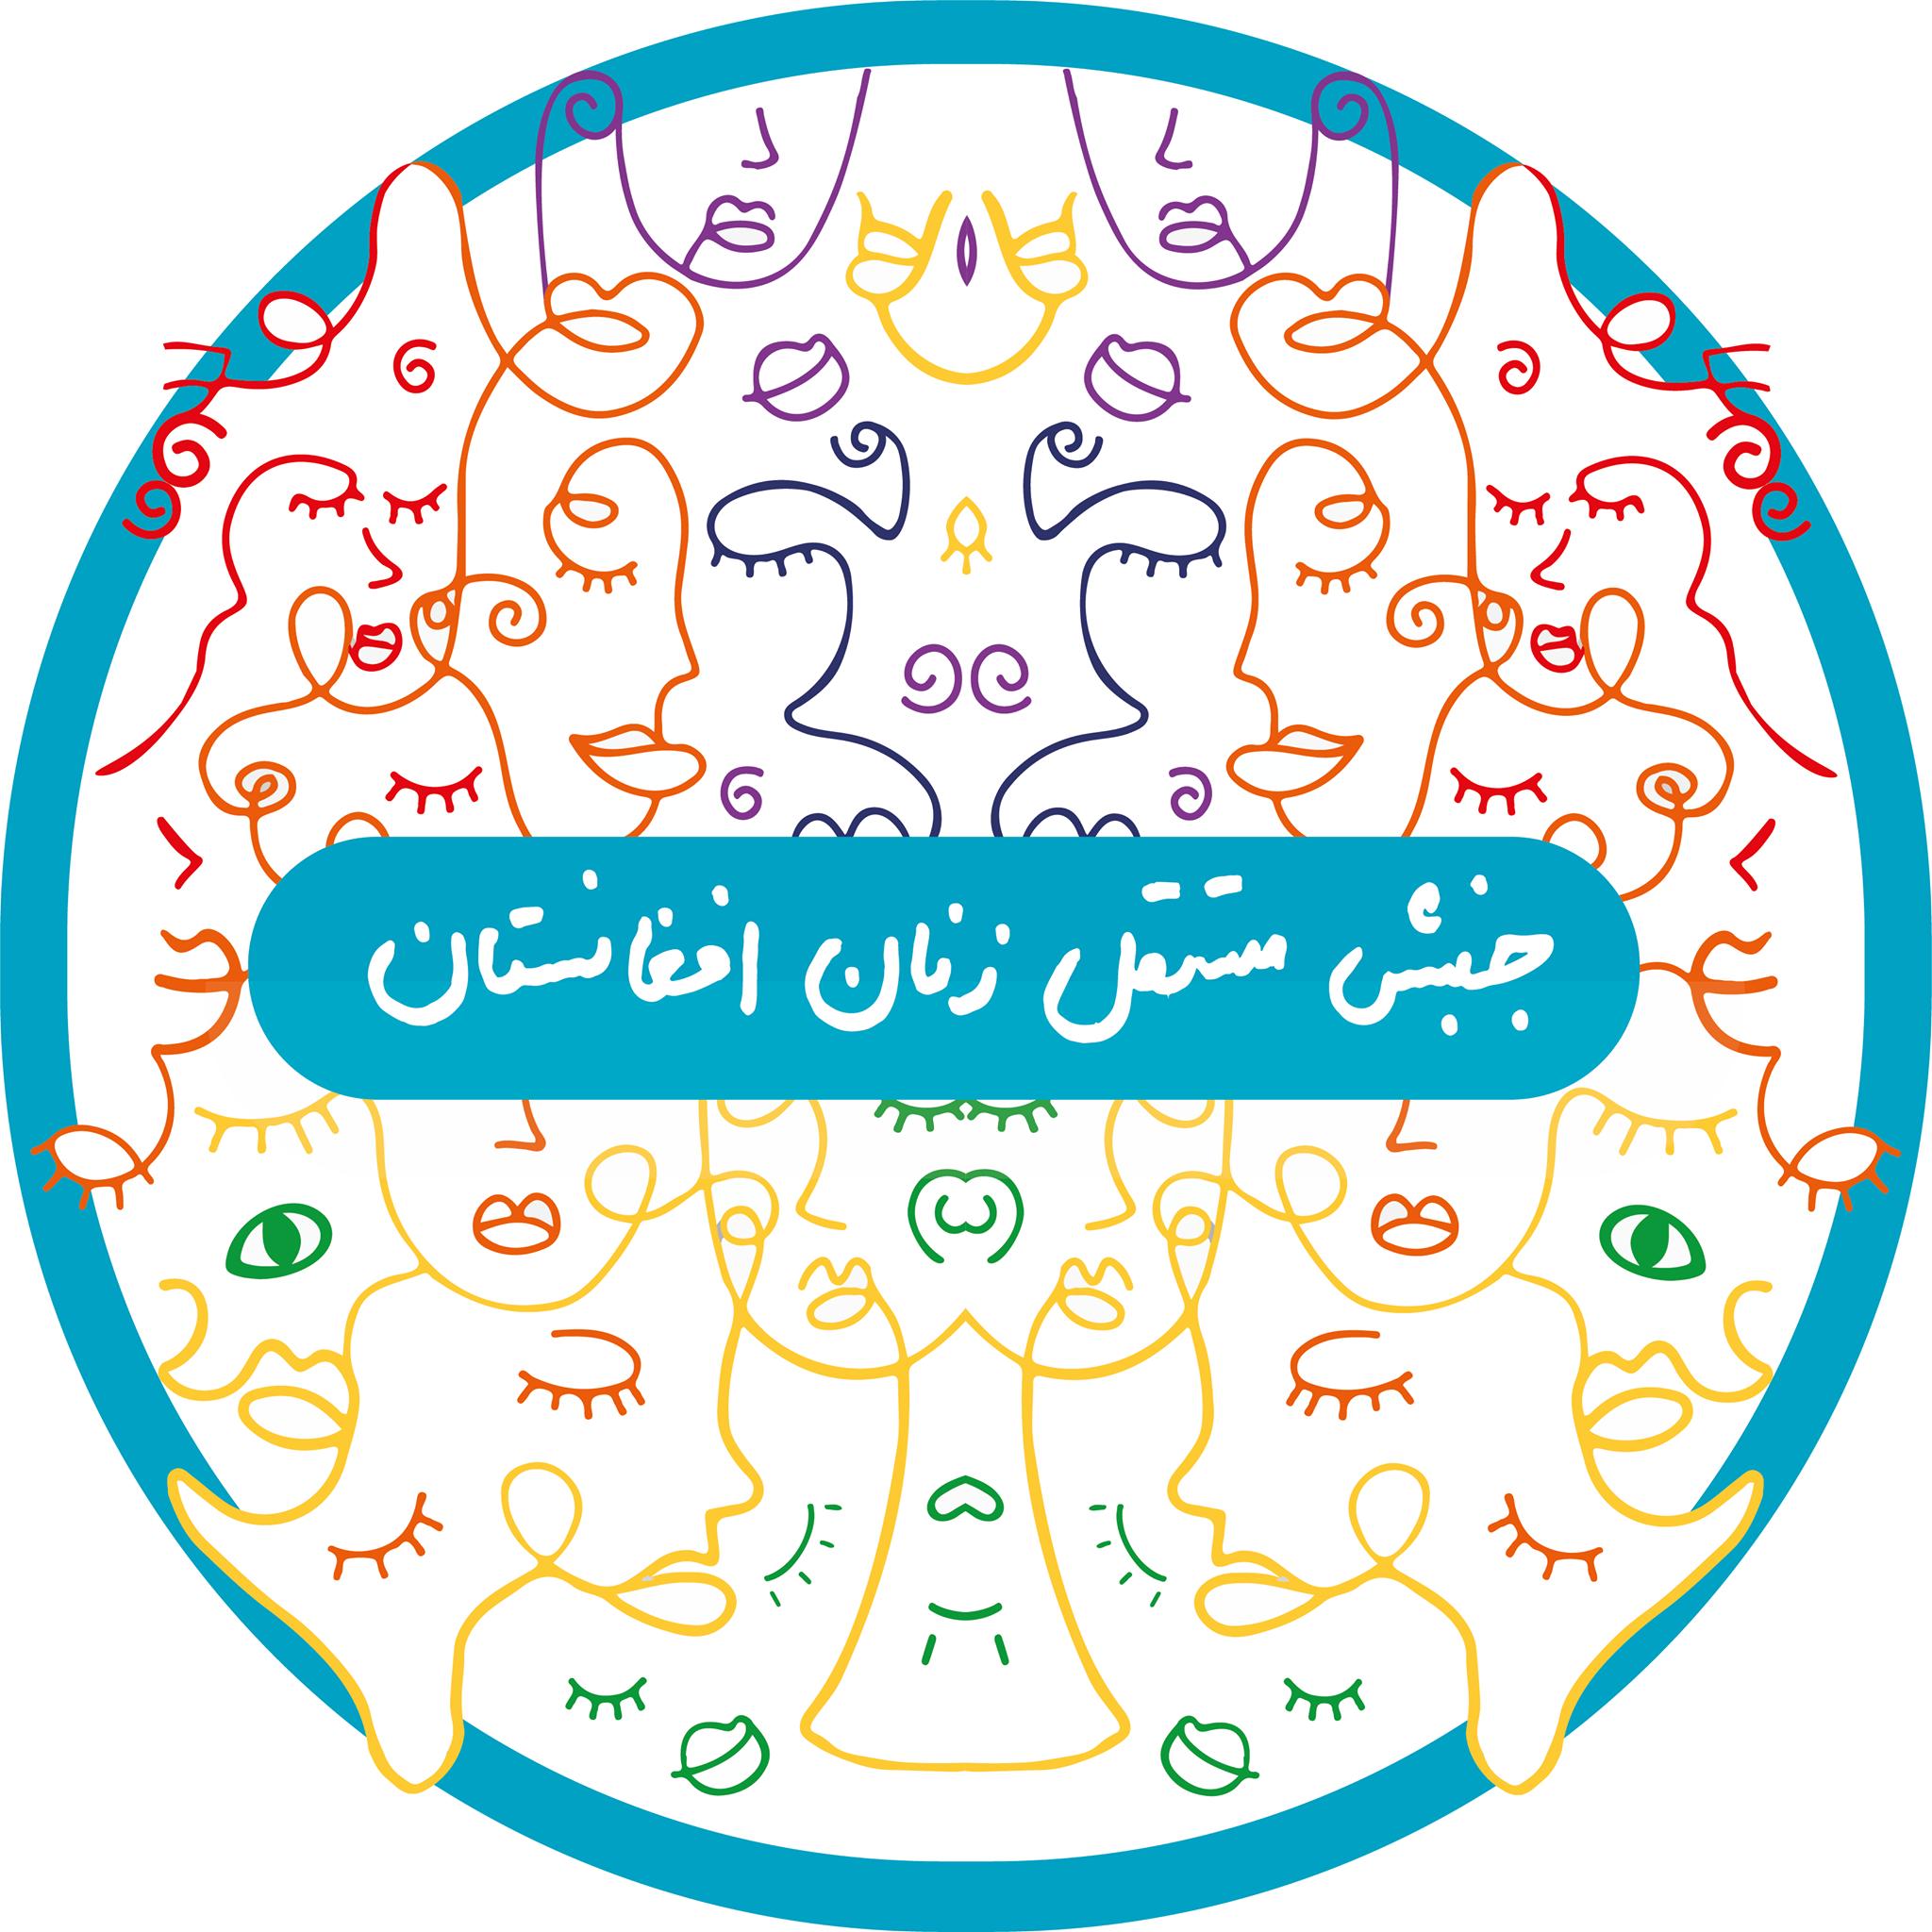 مانیفست جنبش مستقل زنان افغانستان